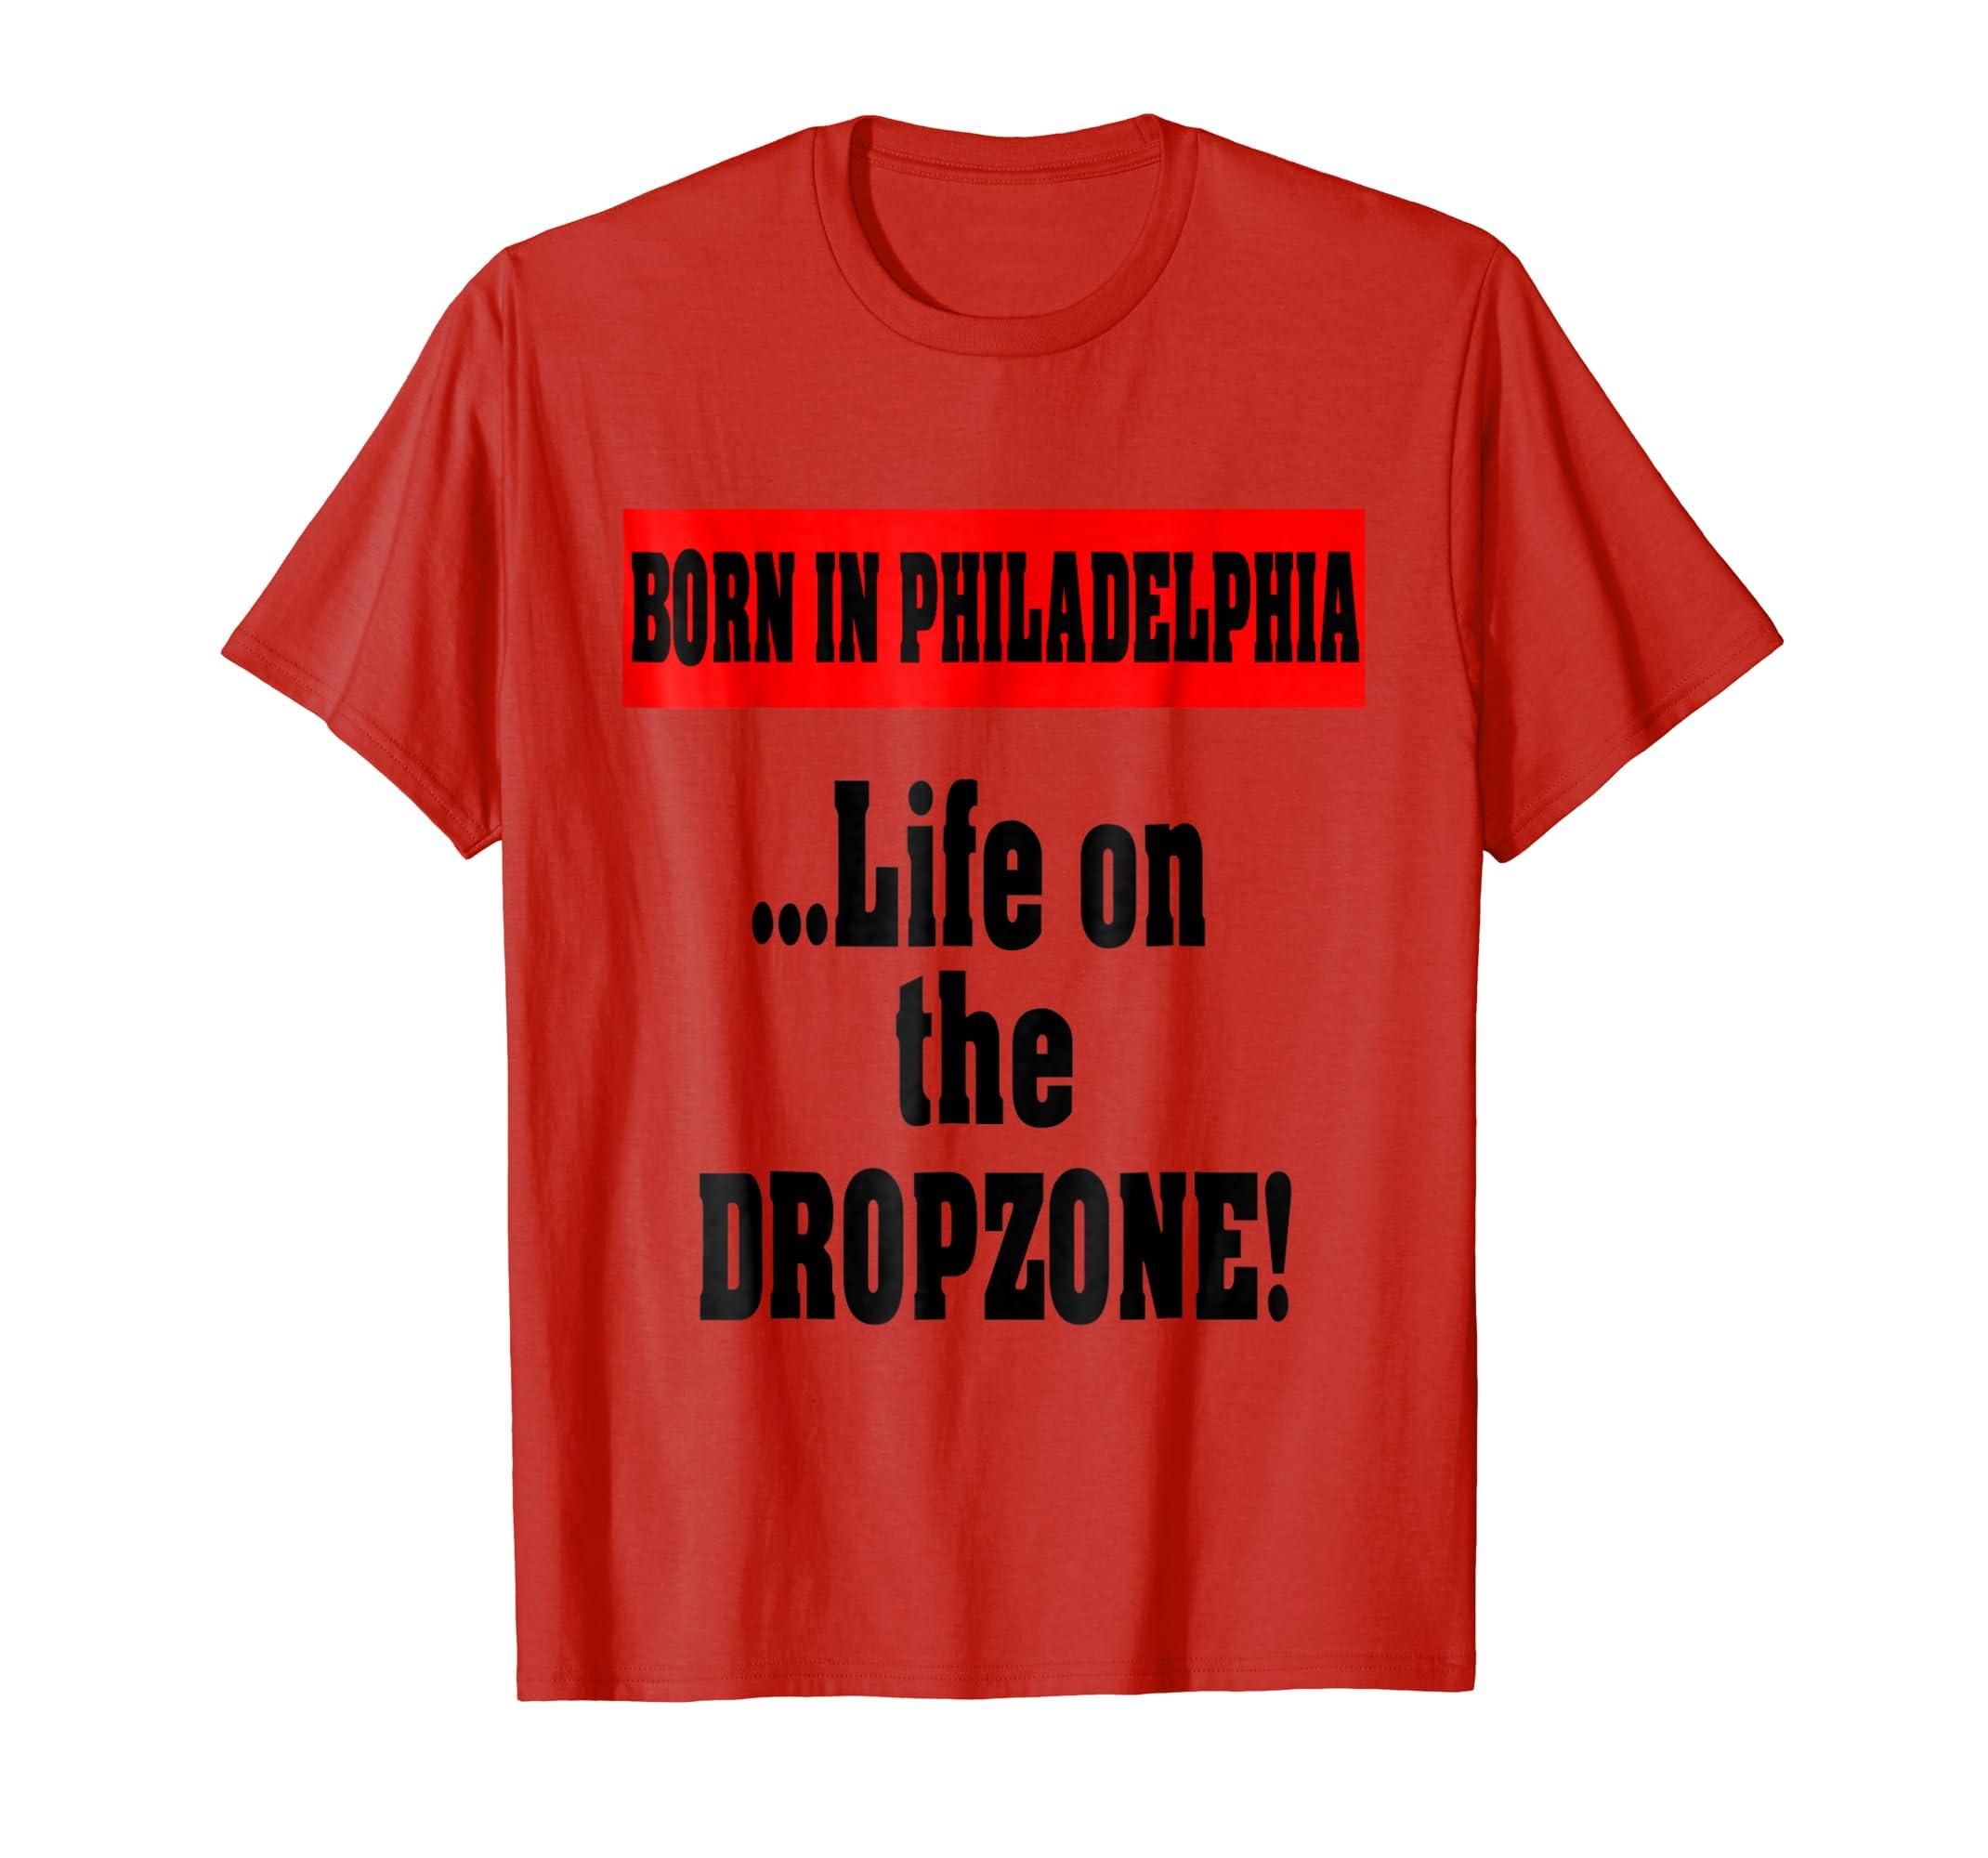 BORN IN PHILADELPHIA ...Life on the DROPZONE!-SFL